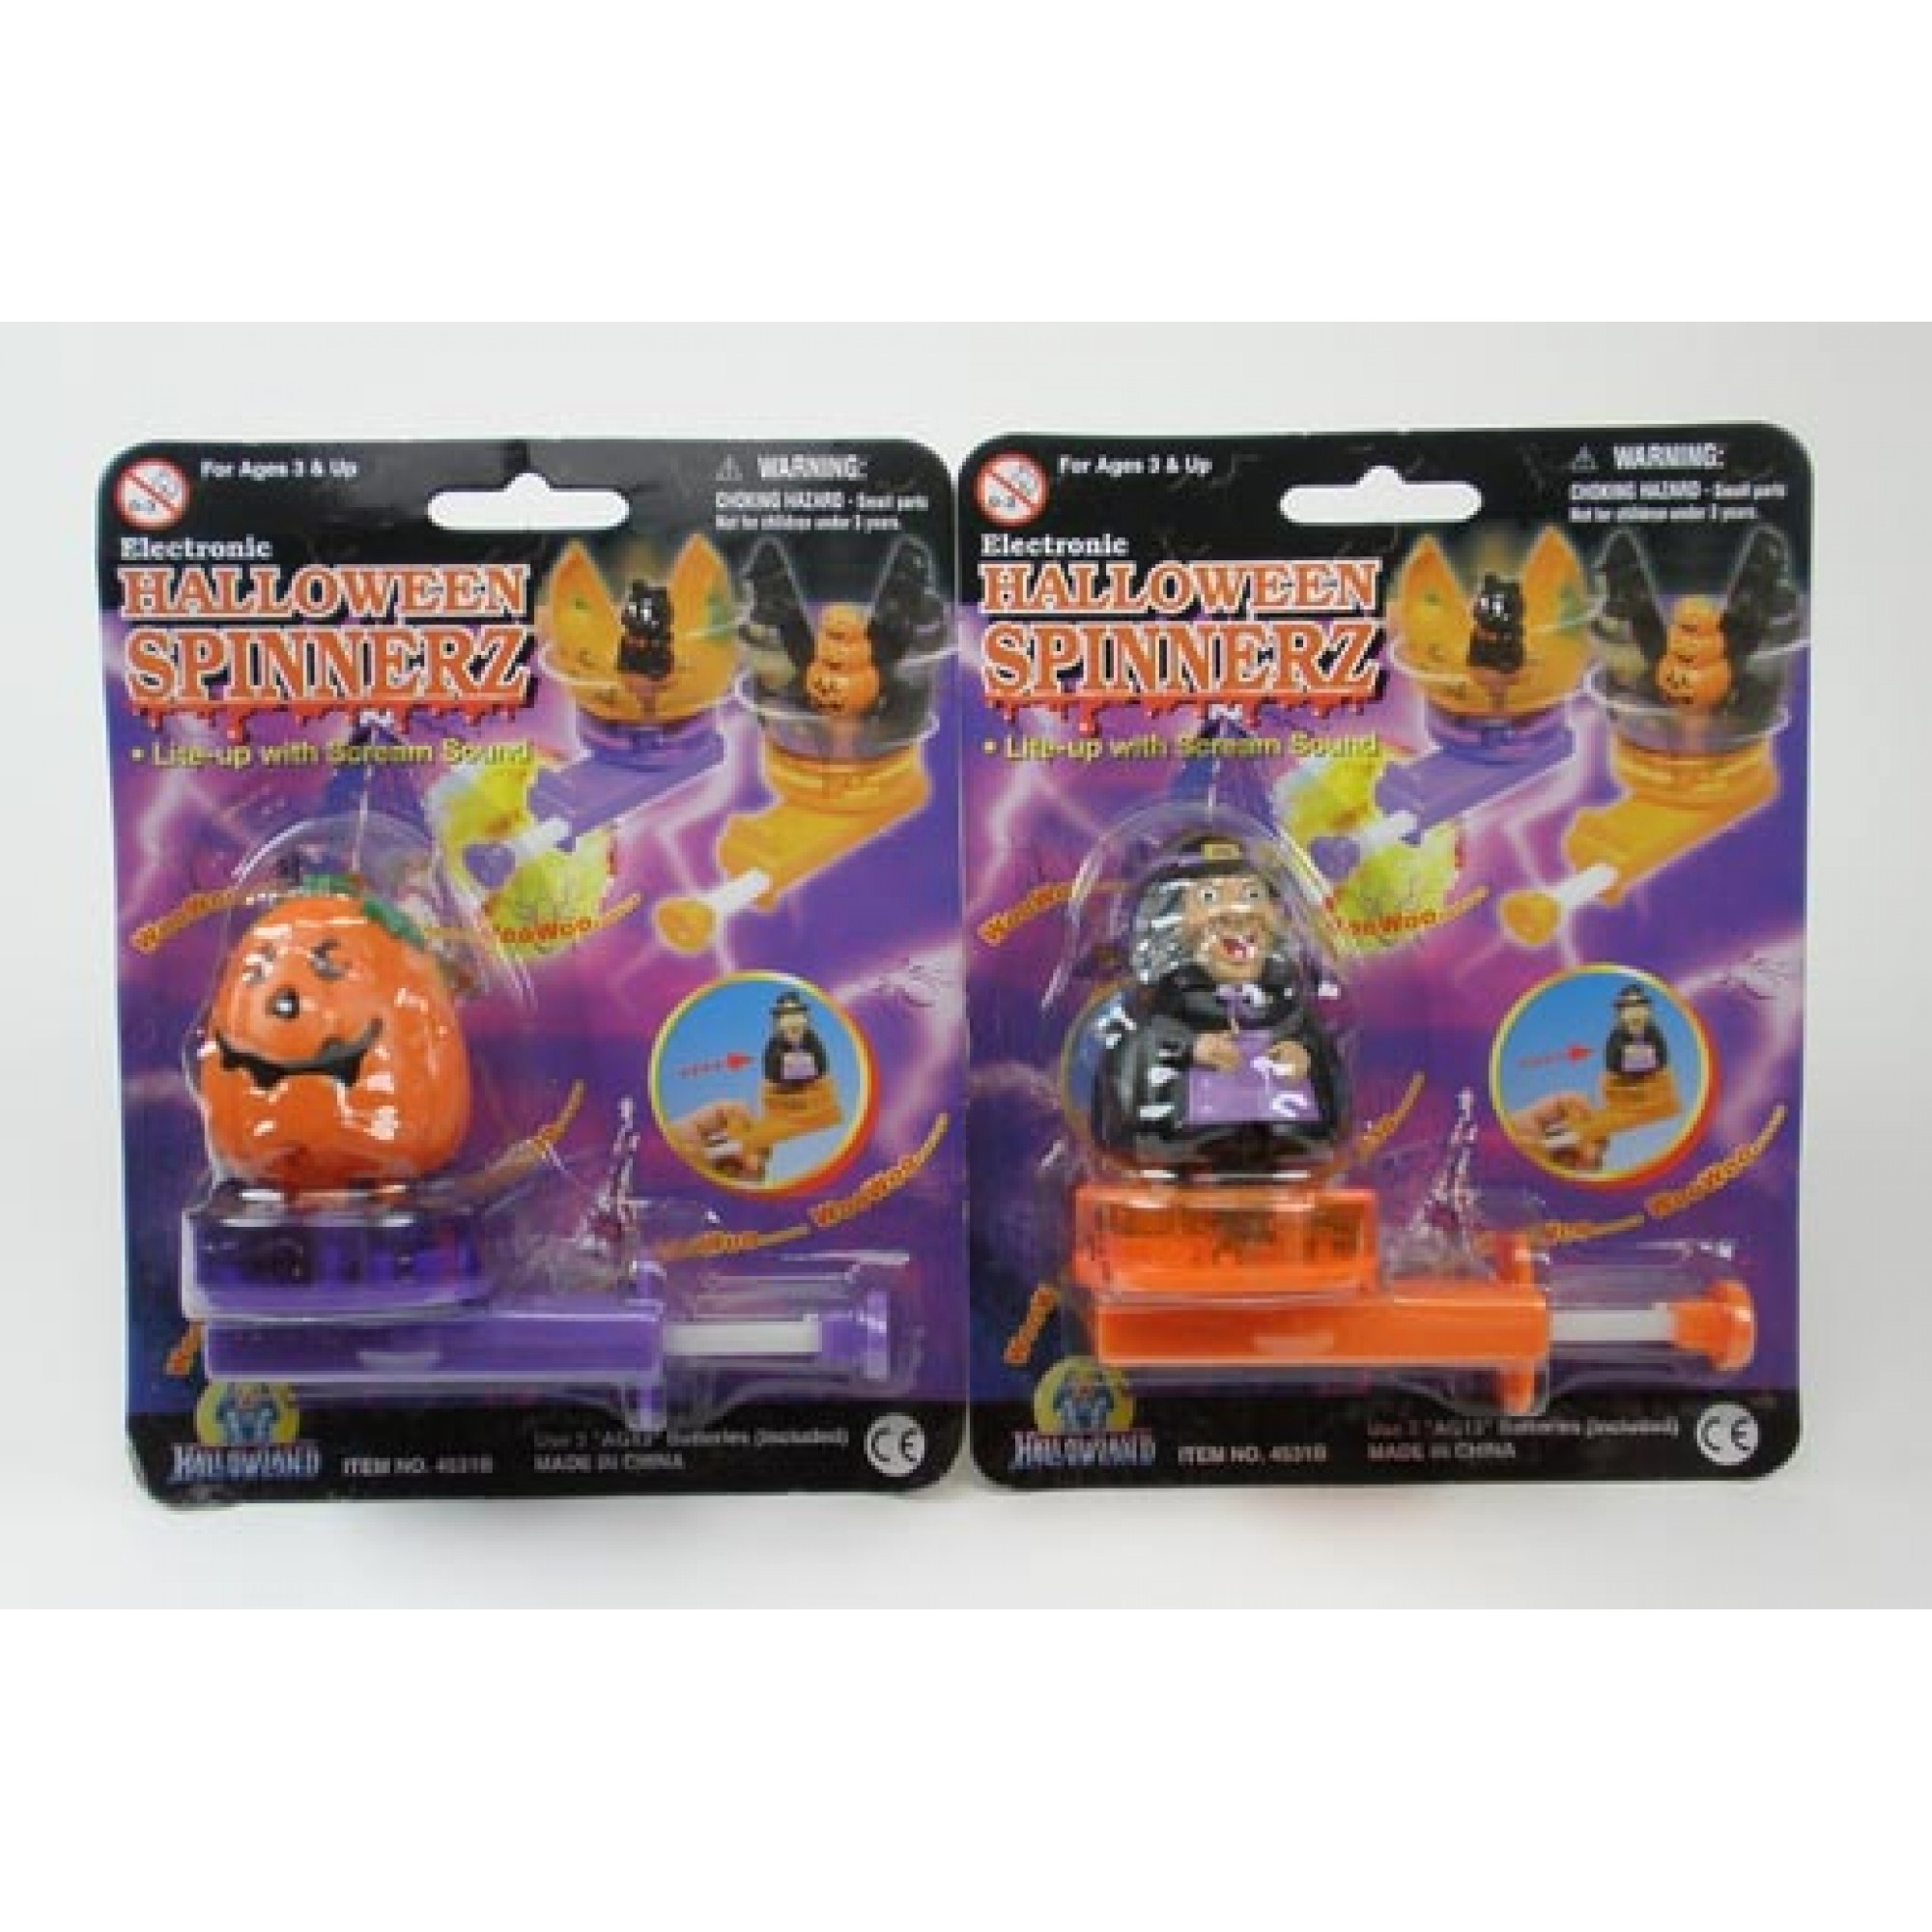 Spinning Pumpkin & Witch